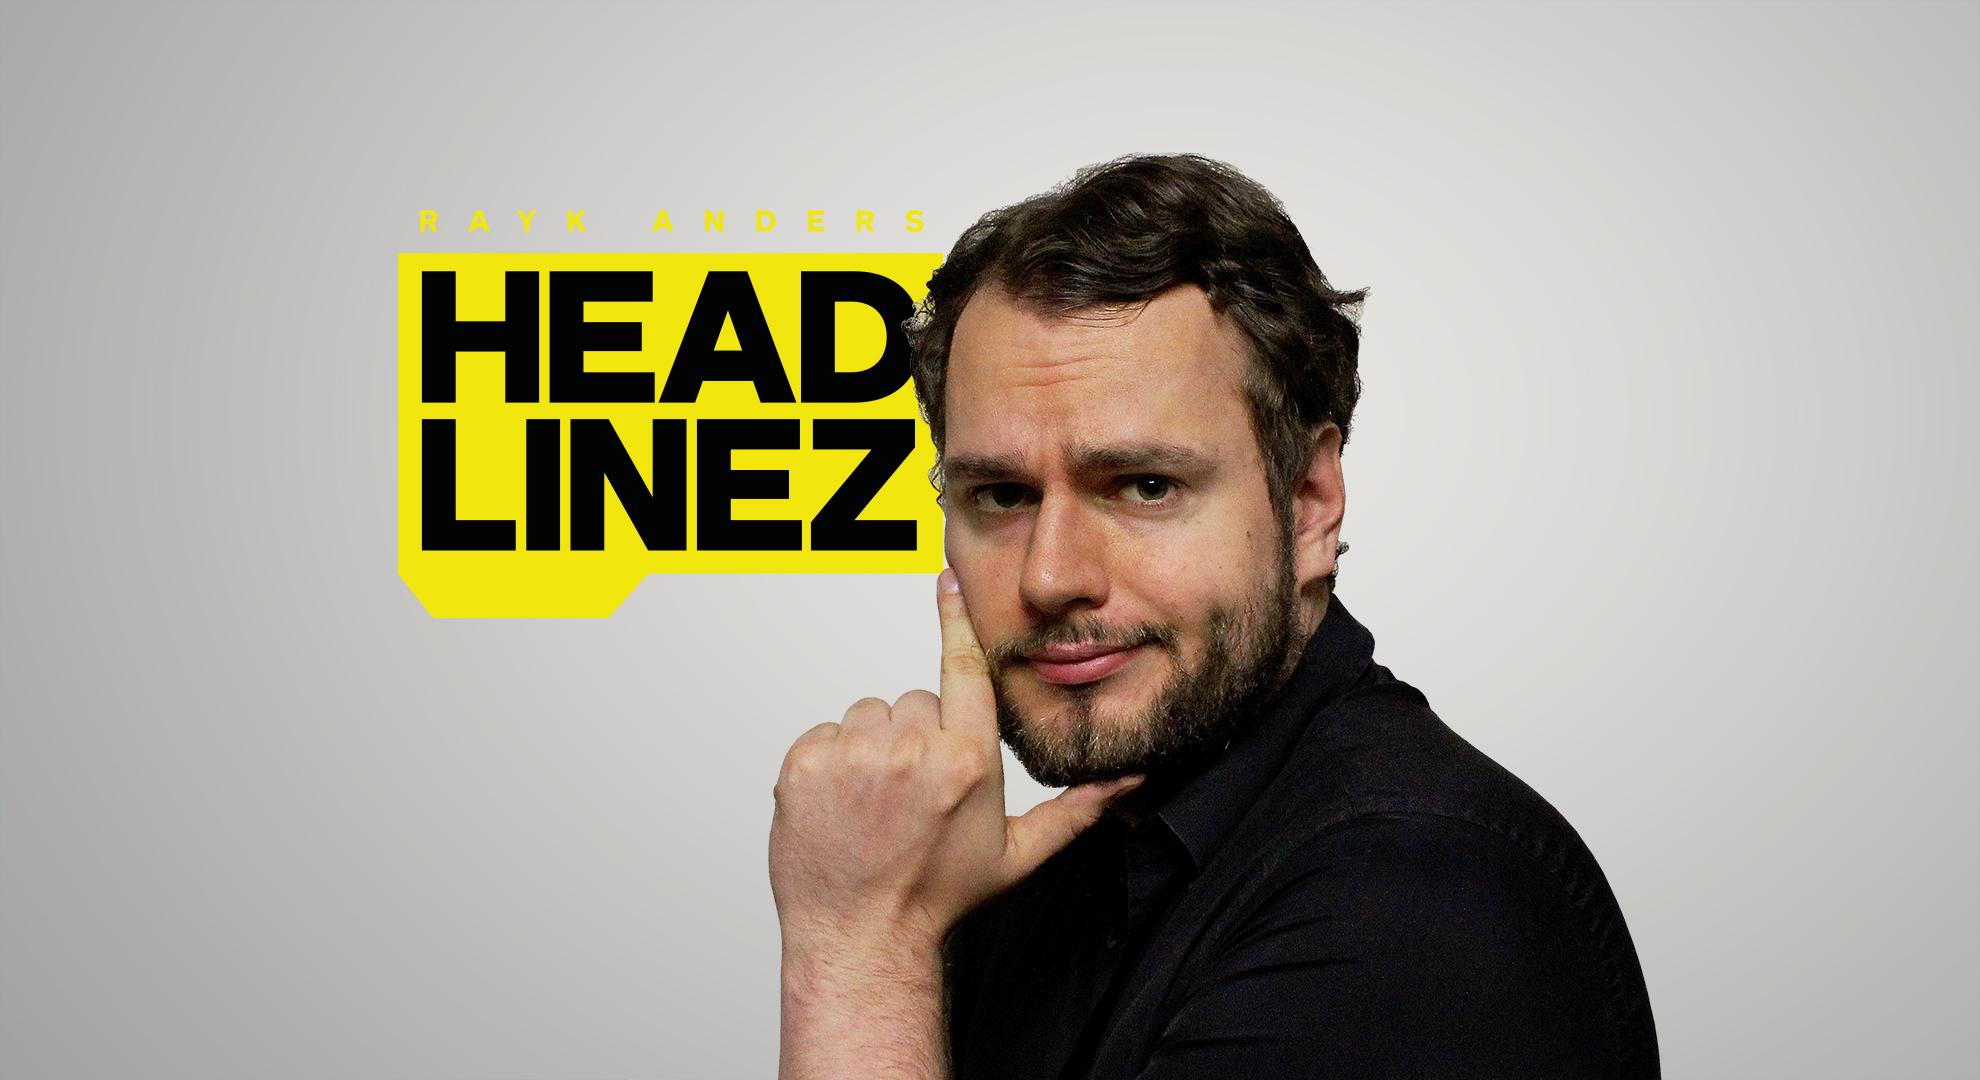 headlinez-rayk-anders-fotograf-rayk-anders